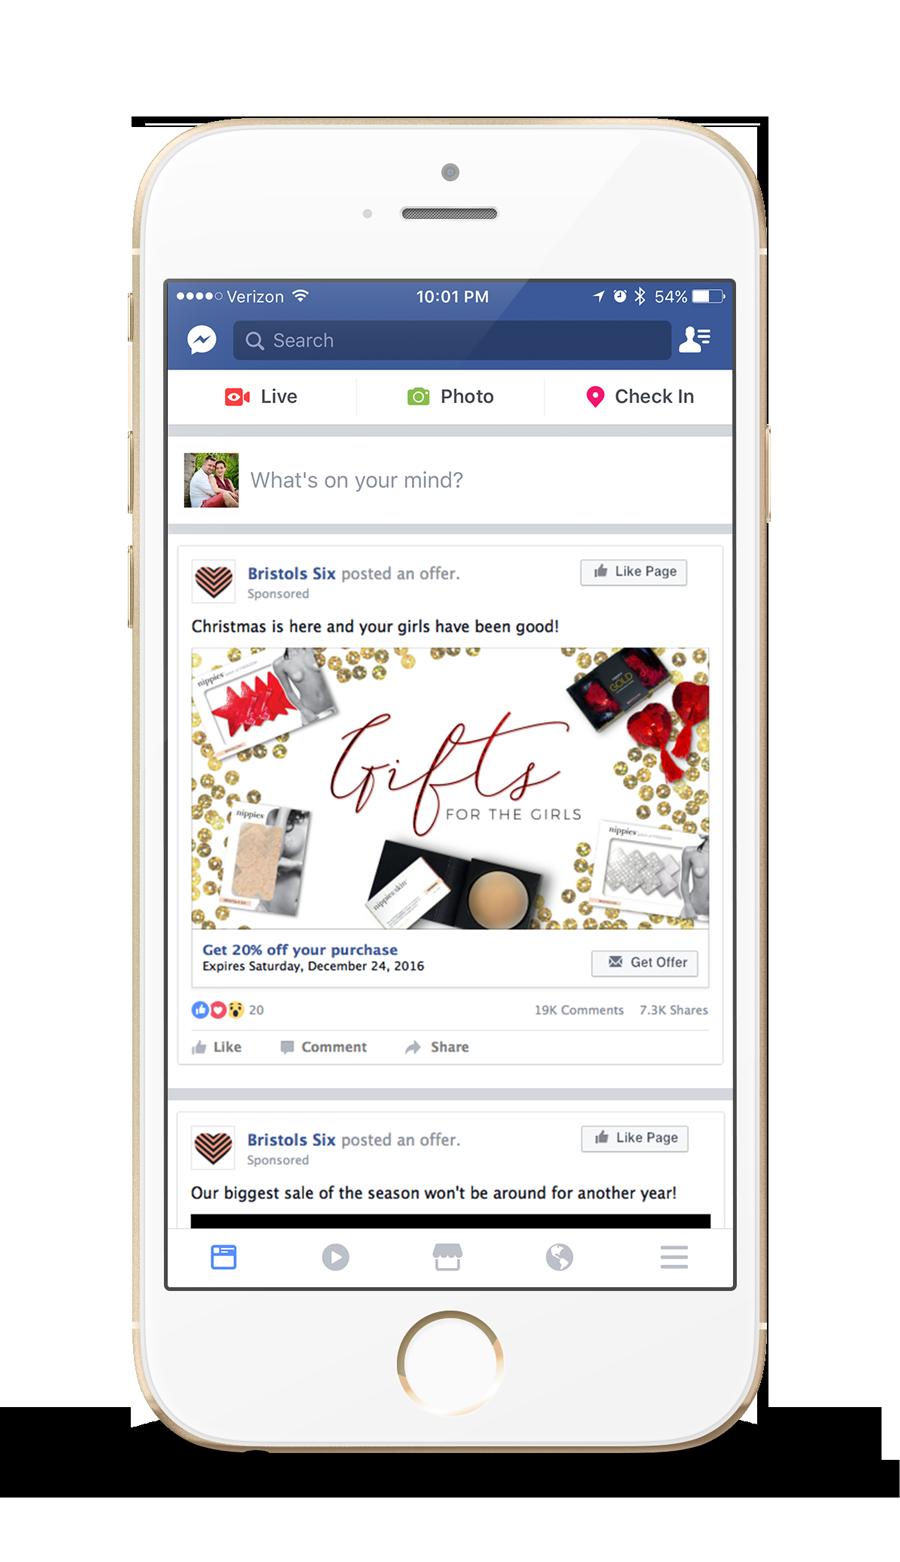 B6_Facebook_ad2.png